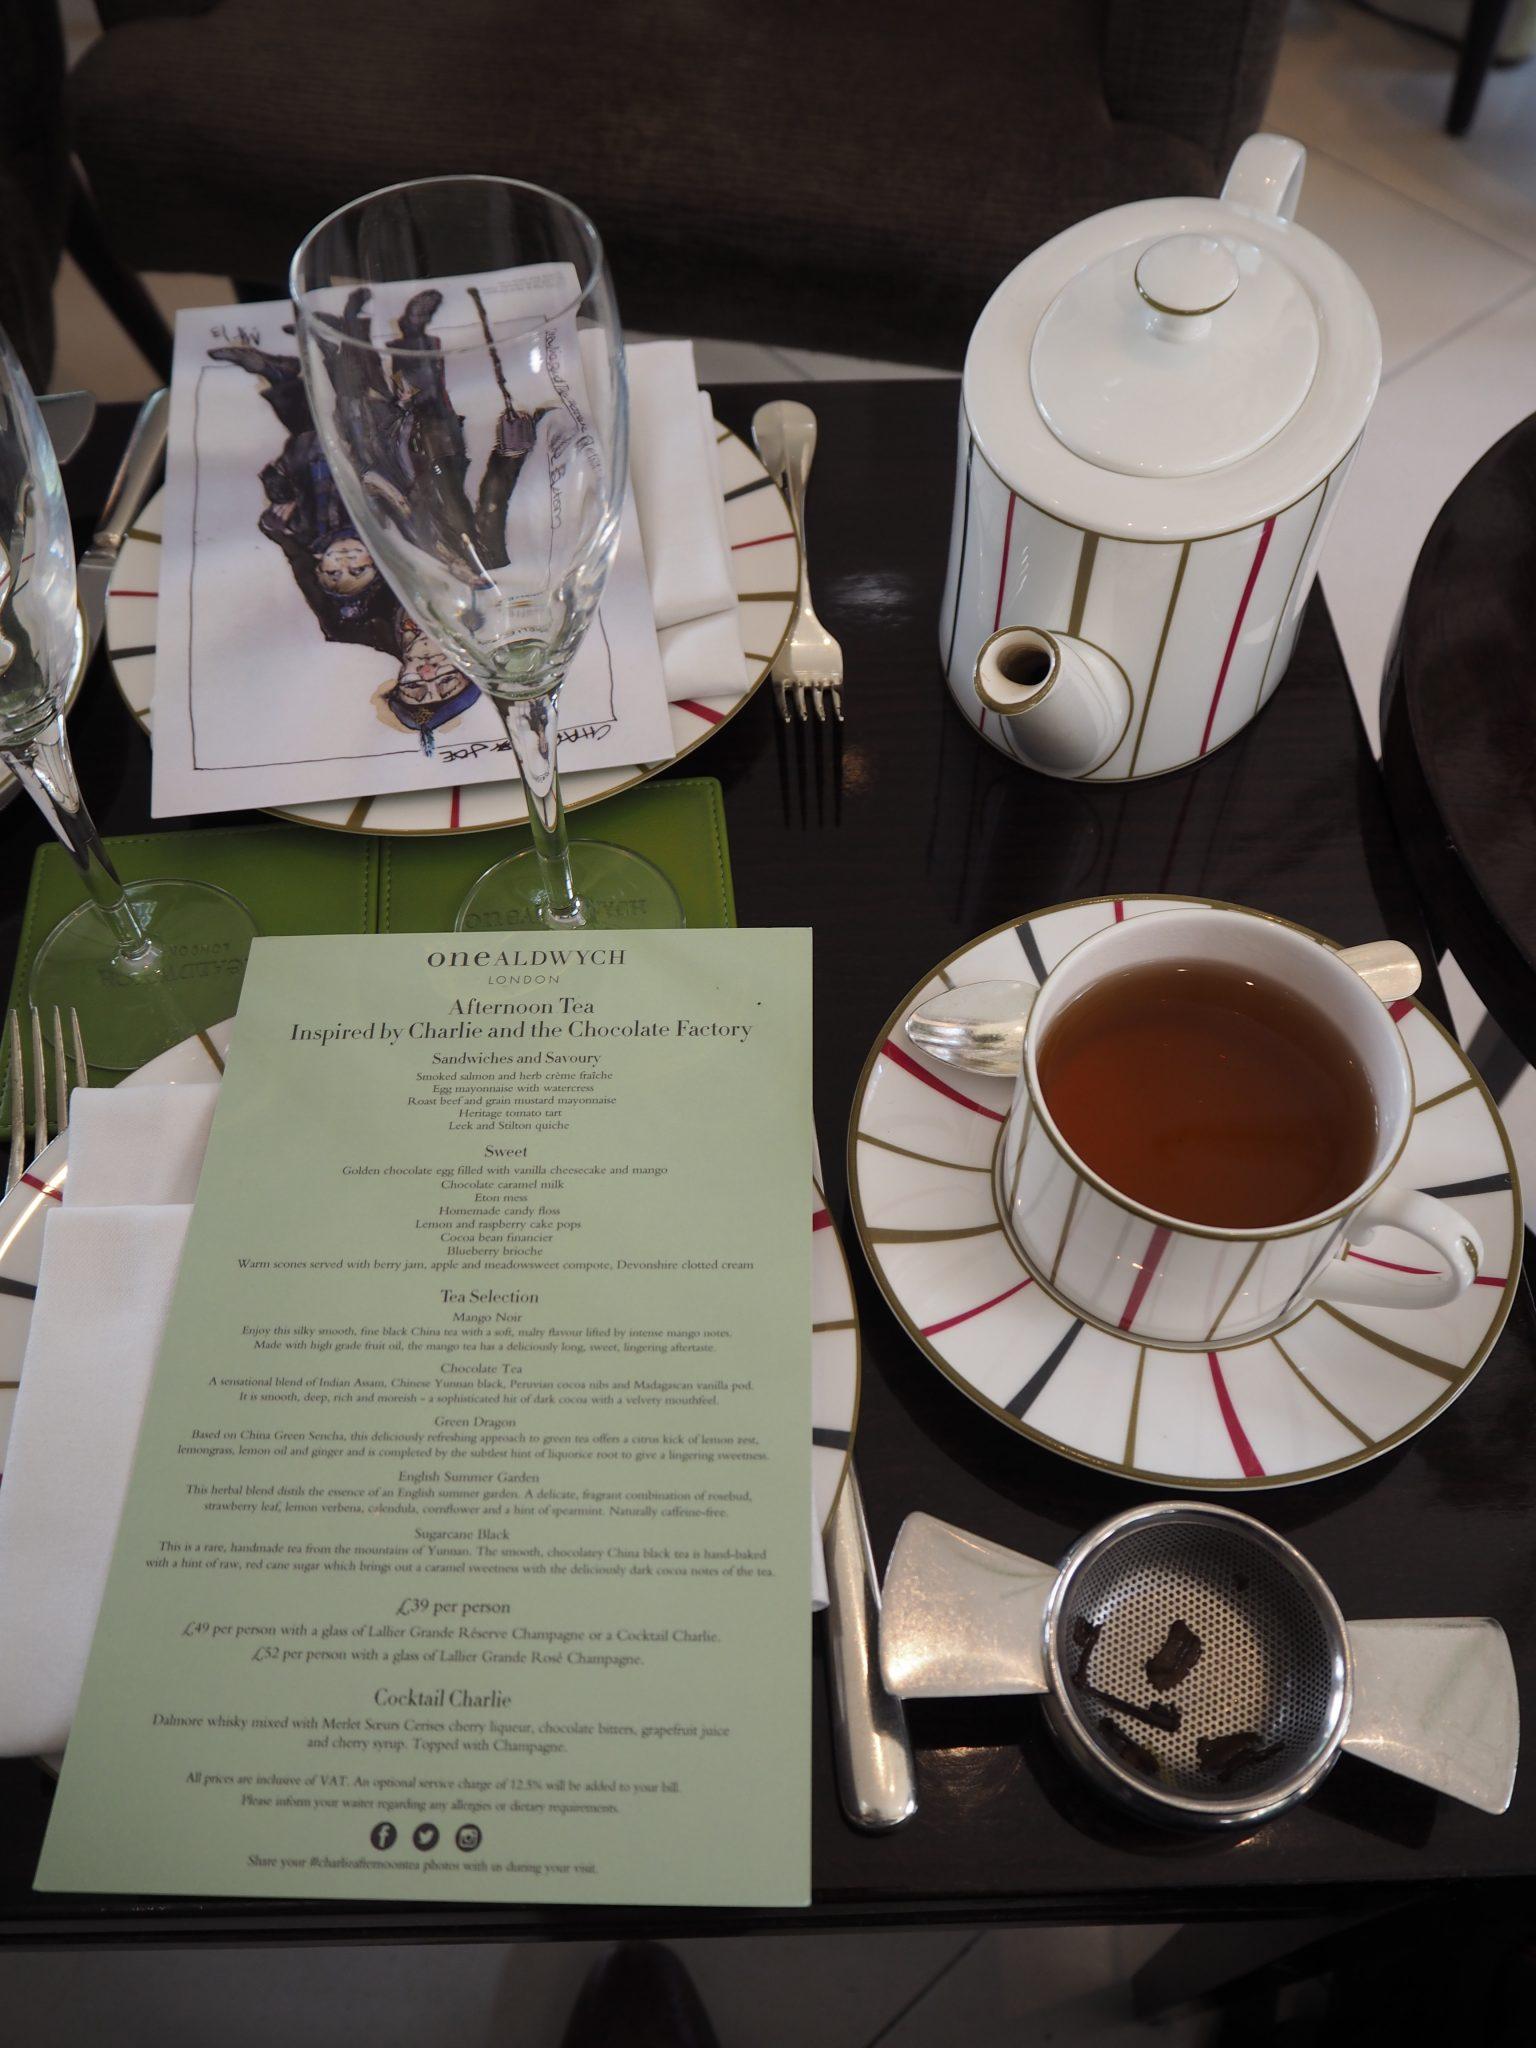 Afternoon Tea Menu & Mango Noir Tea